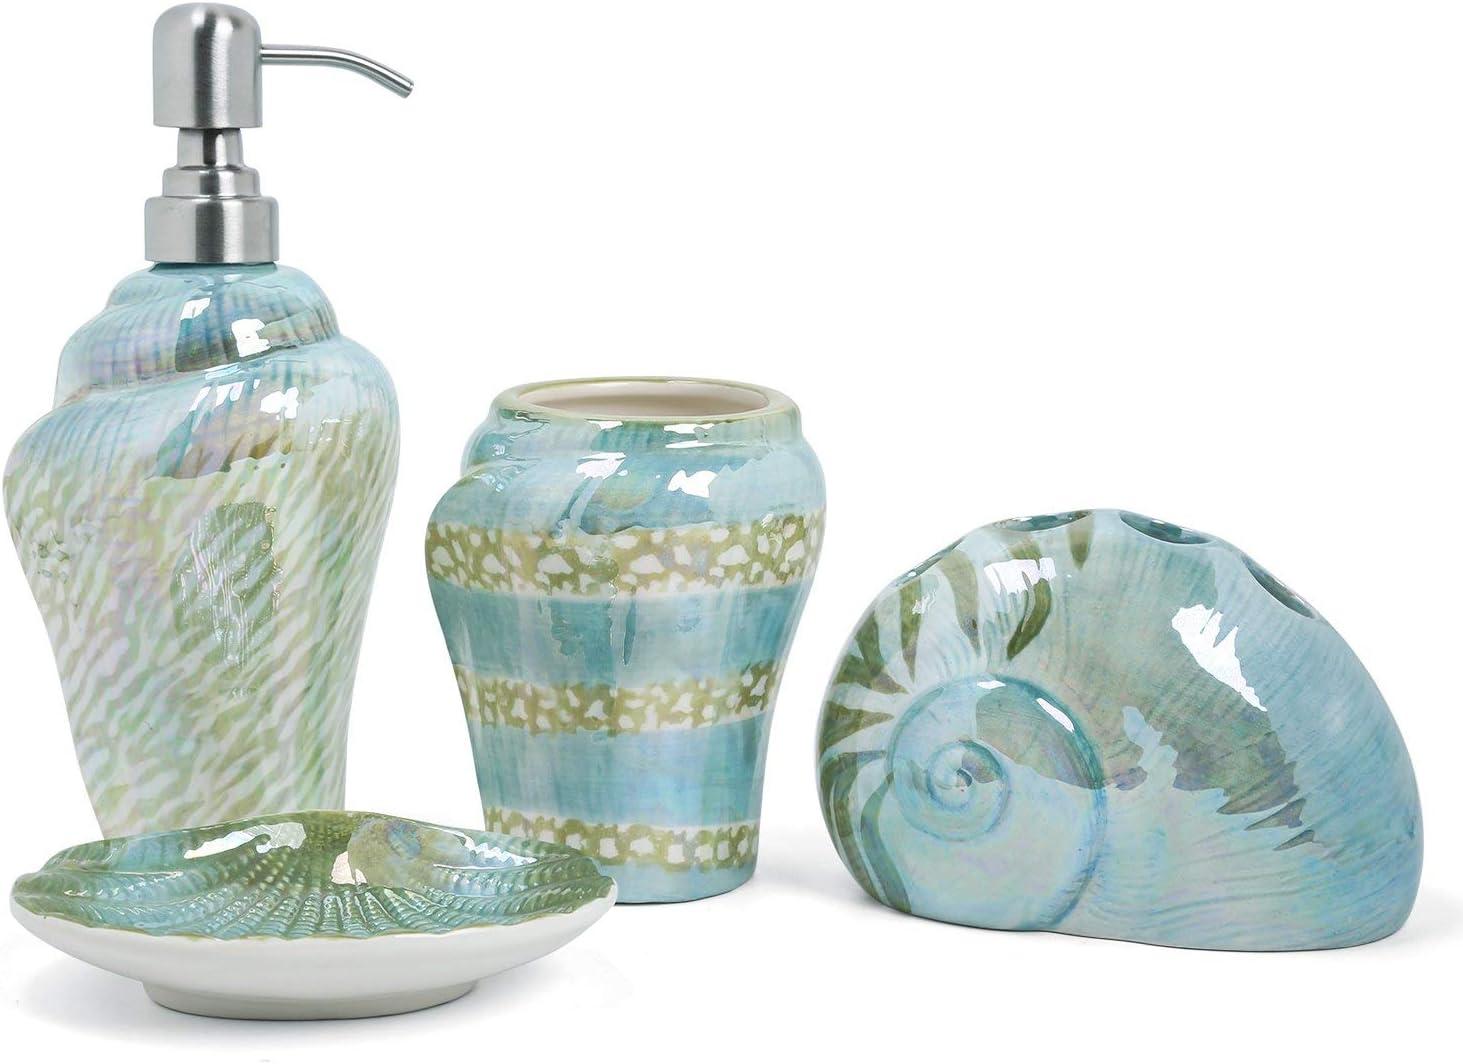 PEHOST Ceramic Bathroom Accessory Set Mediterranean Sea Snail Soap Dish Soap Dispenser Toothbrush Holder Tumbler Cup Verde